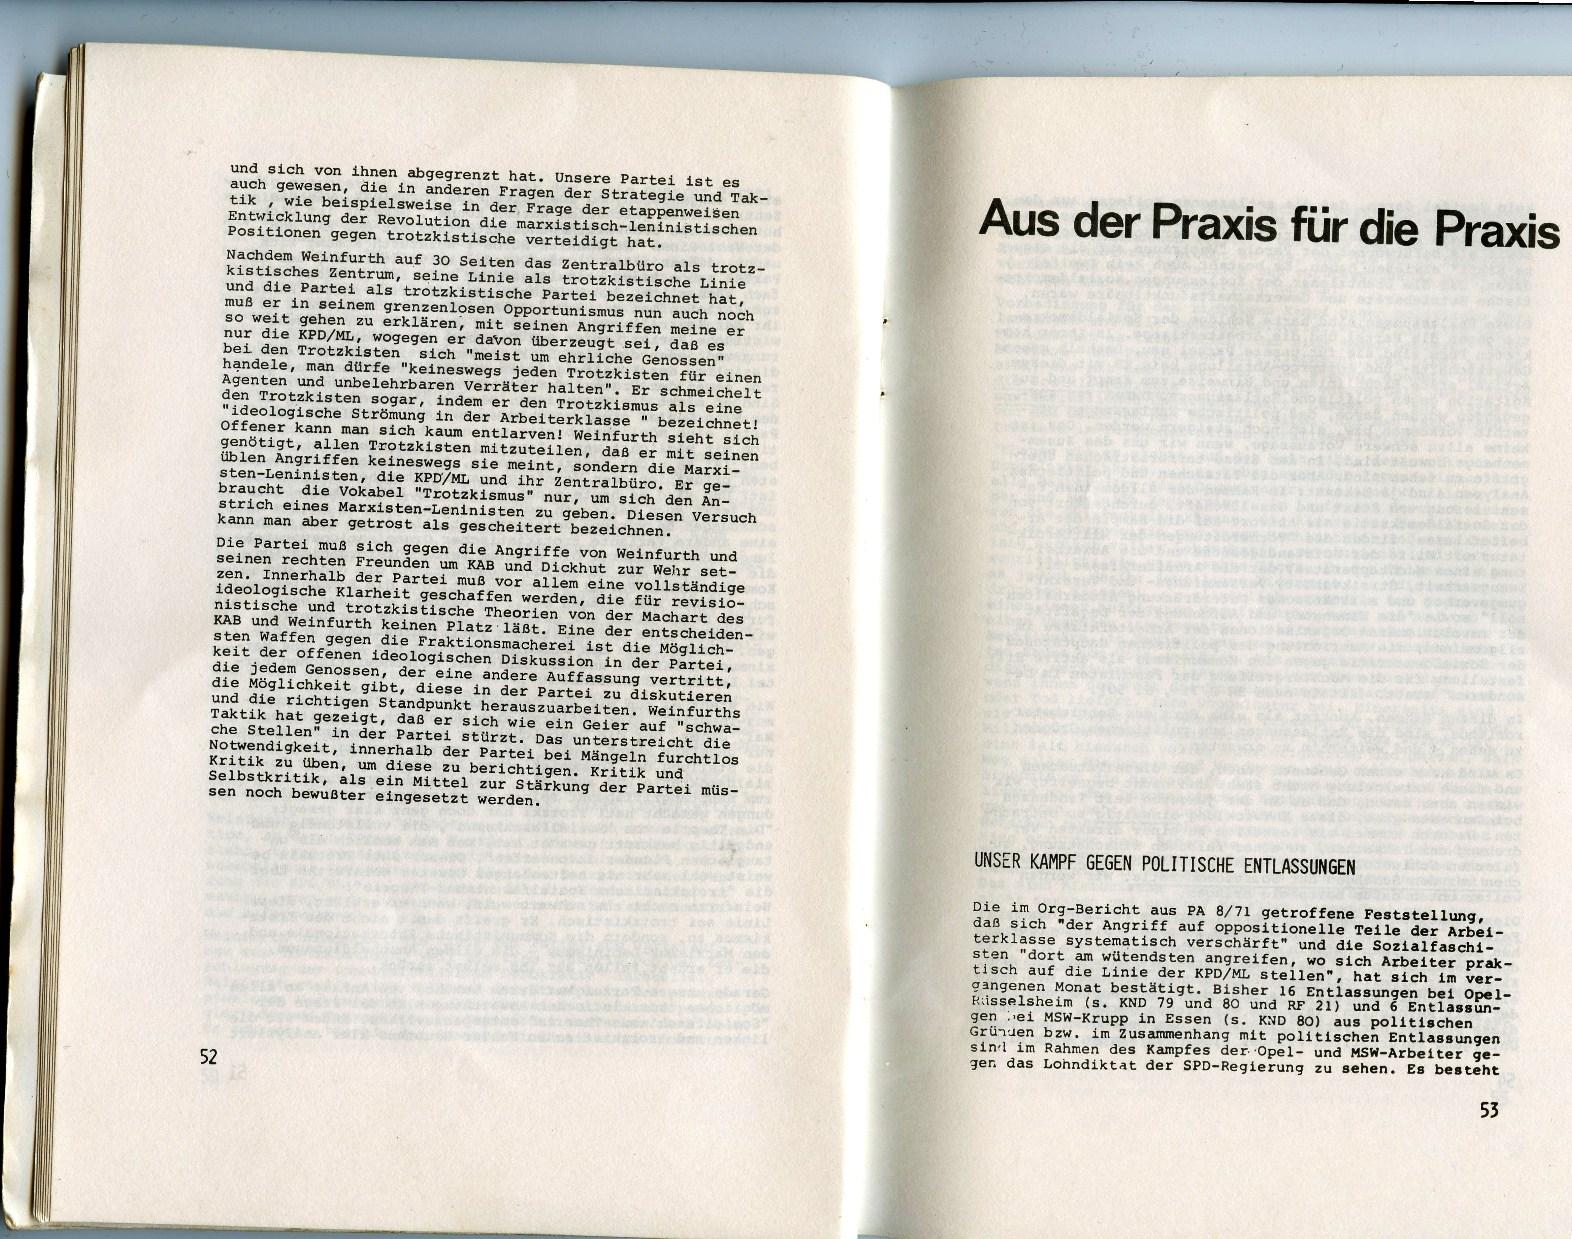 ZB_Parteiarbeiter_1971_09_27